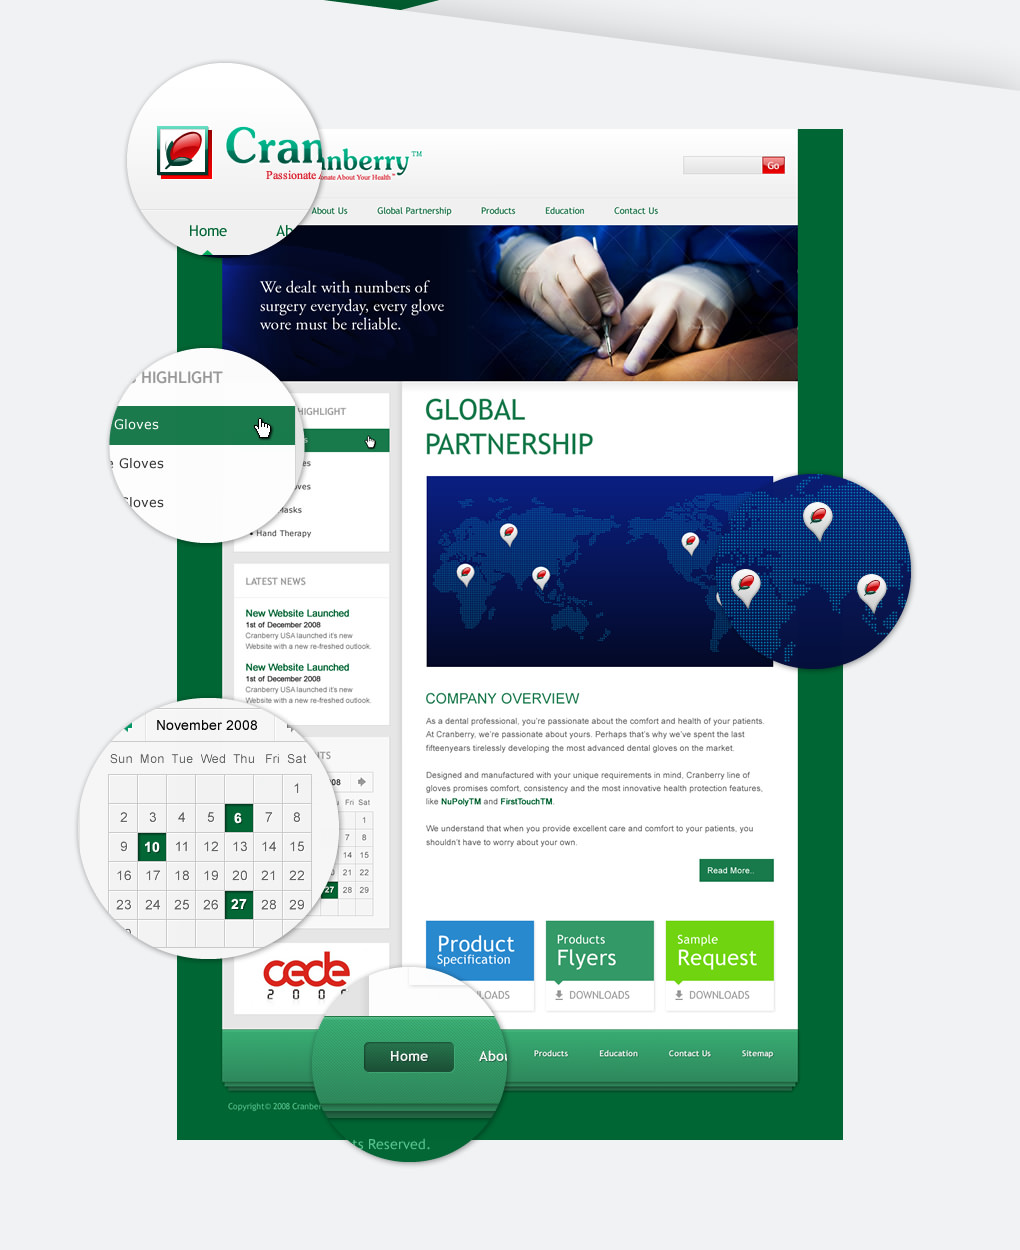 cranberry website layout design